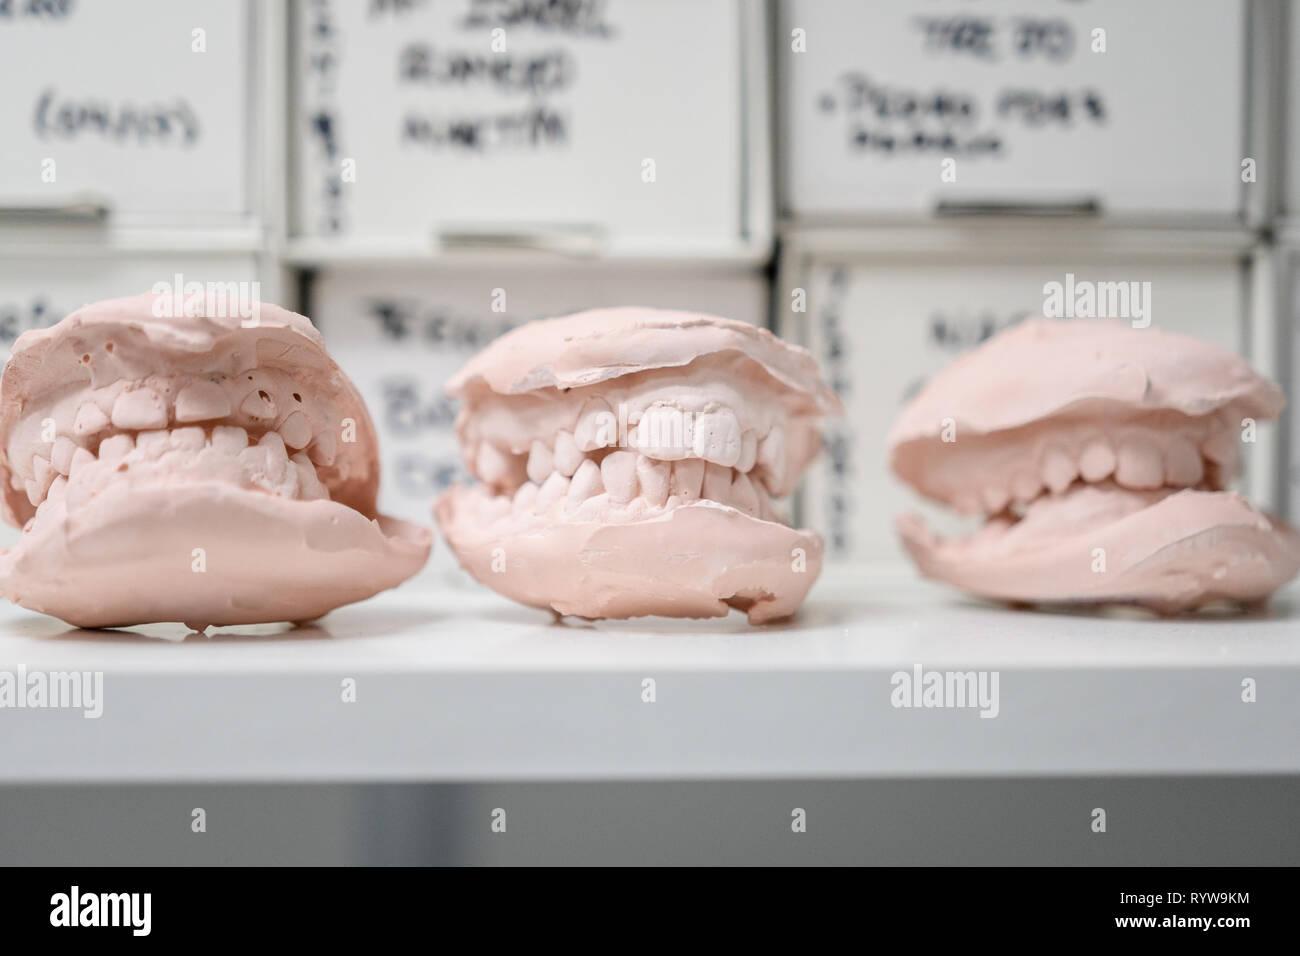 Dental casting gypsum model plaster cast stomatologic human jaws prothetic laboratory, technical shots - Stock Image